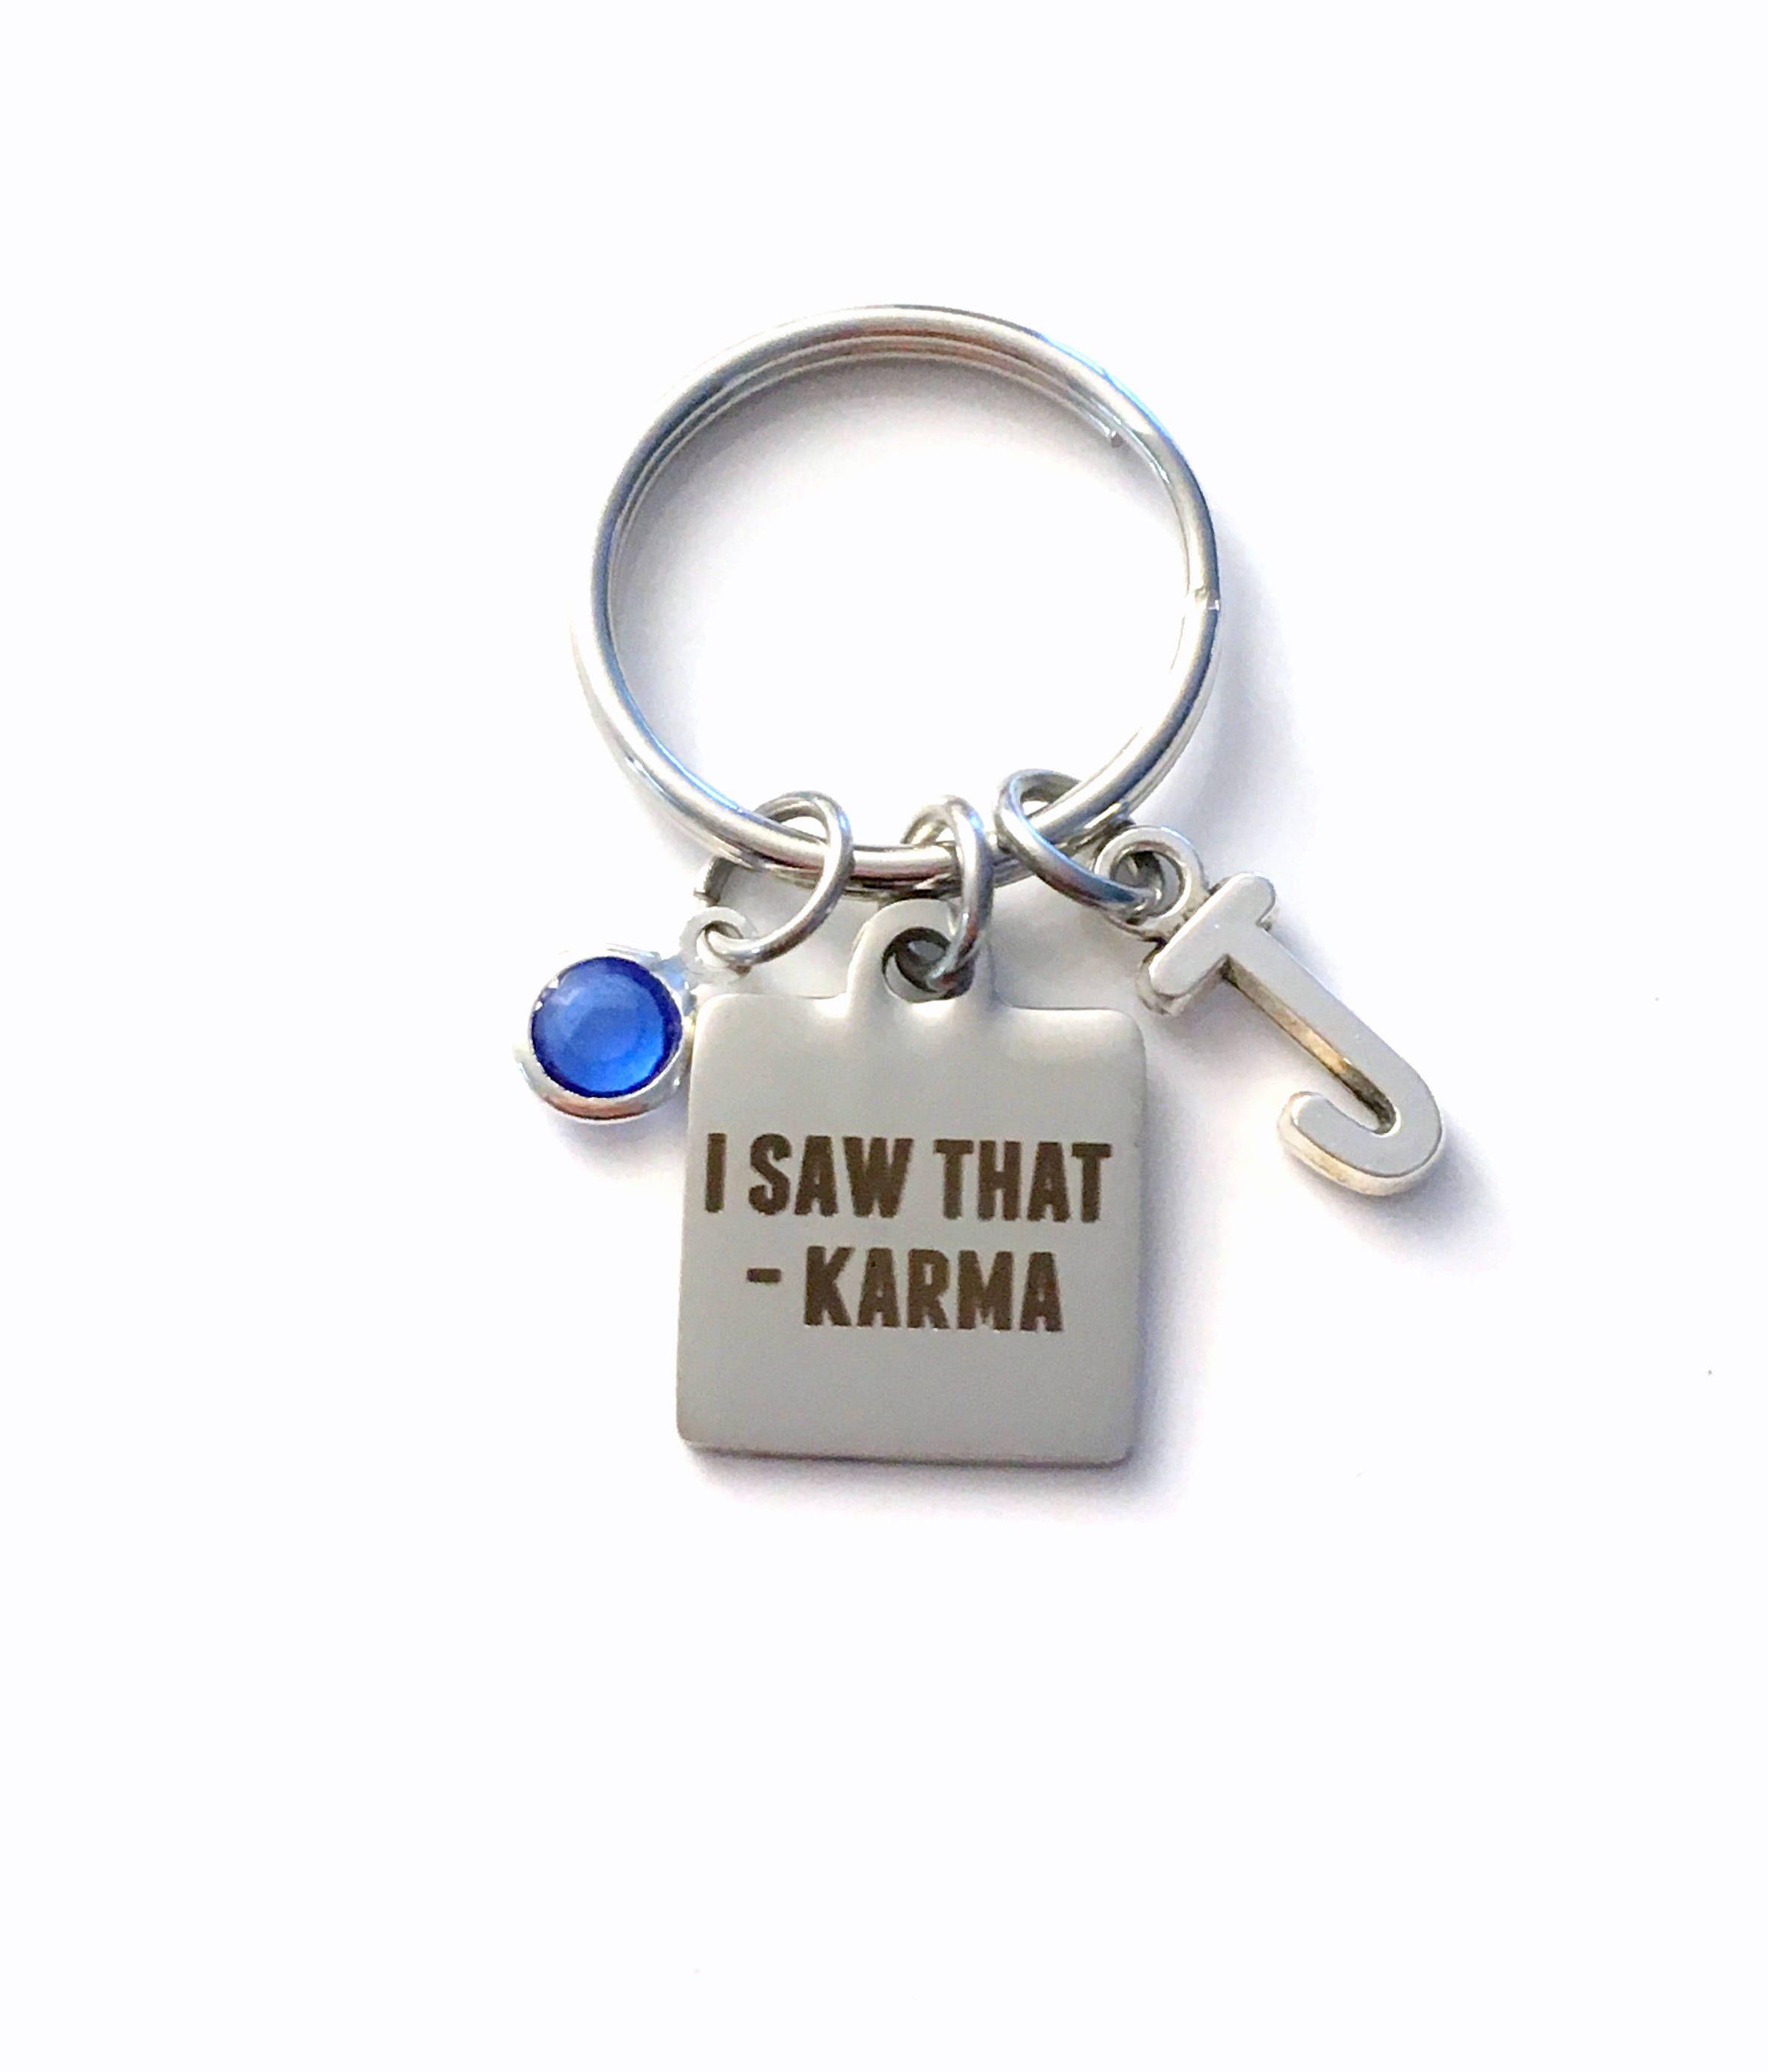 I Saw That Karma Keychain Gift For Best Friend Key Chain Quote